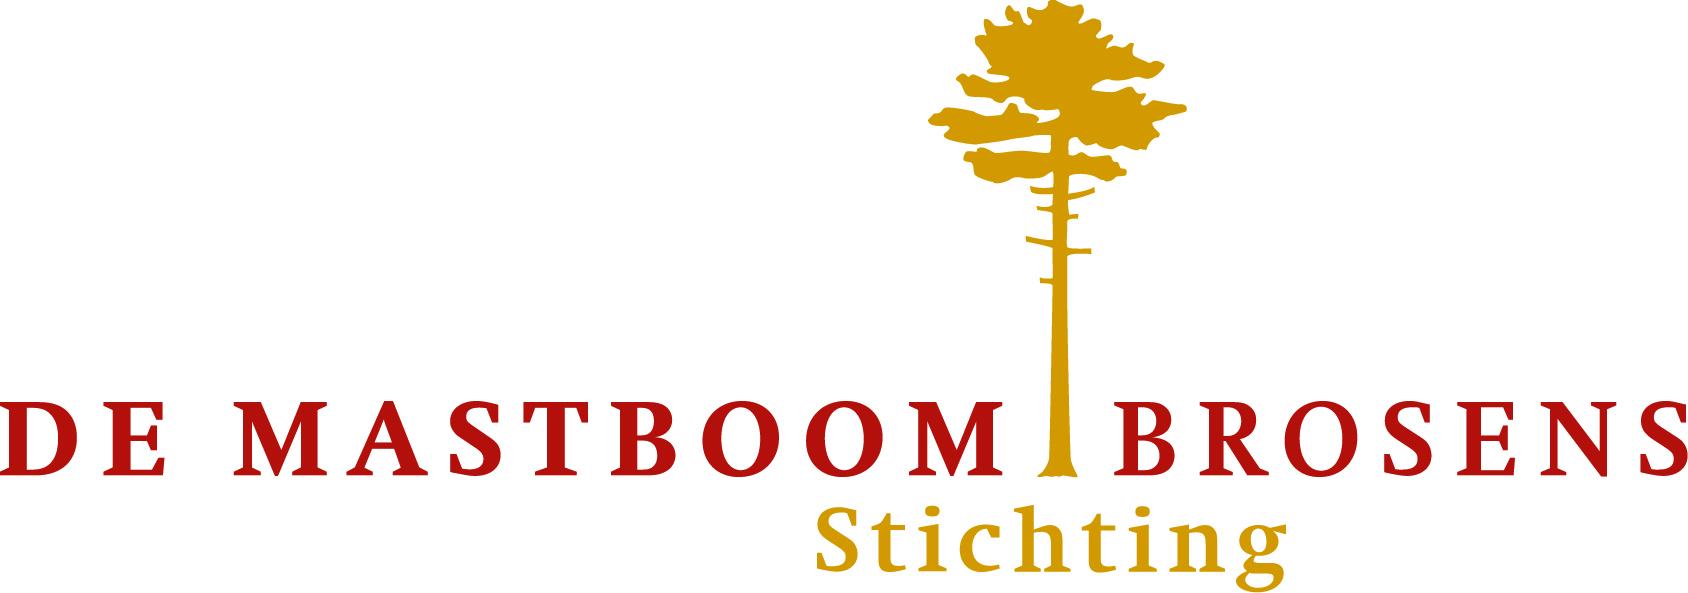 logo Mastboom-Brosens Stichting